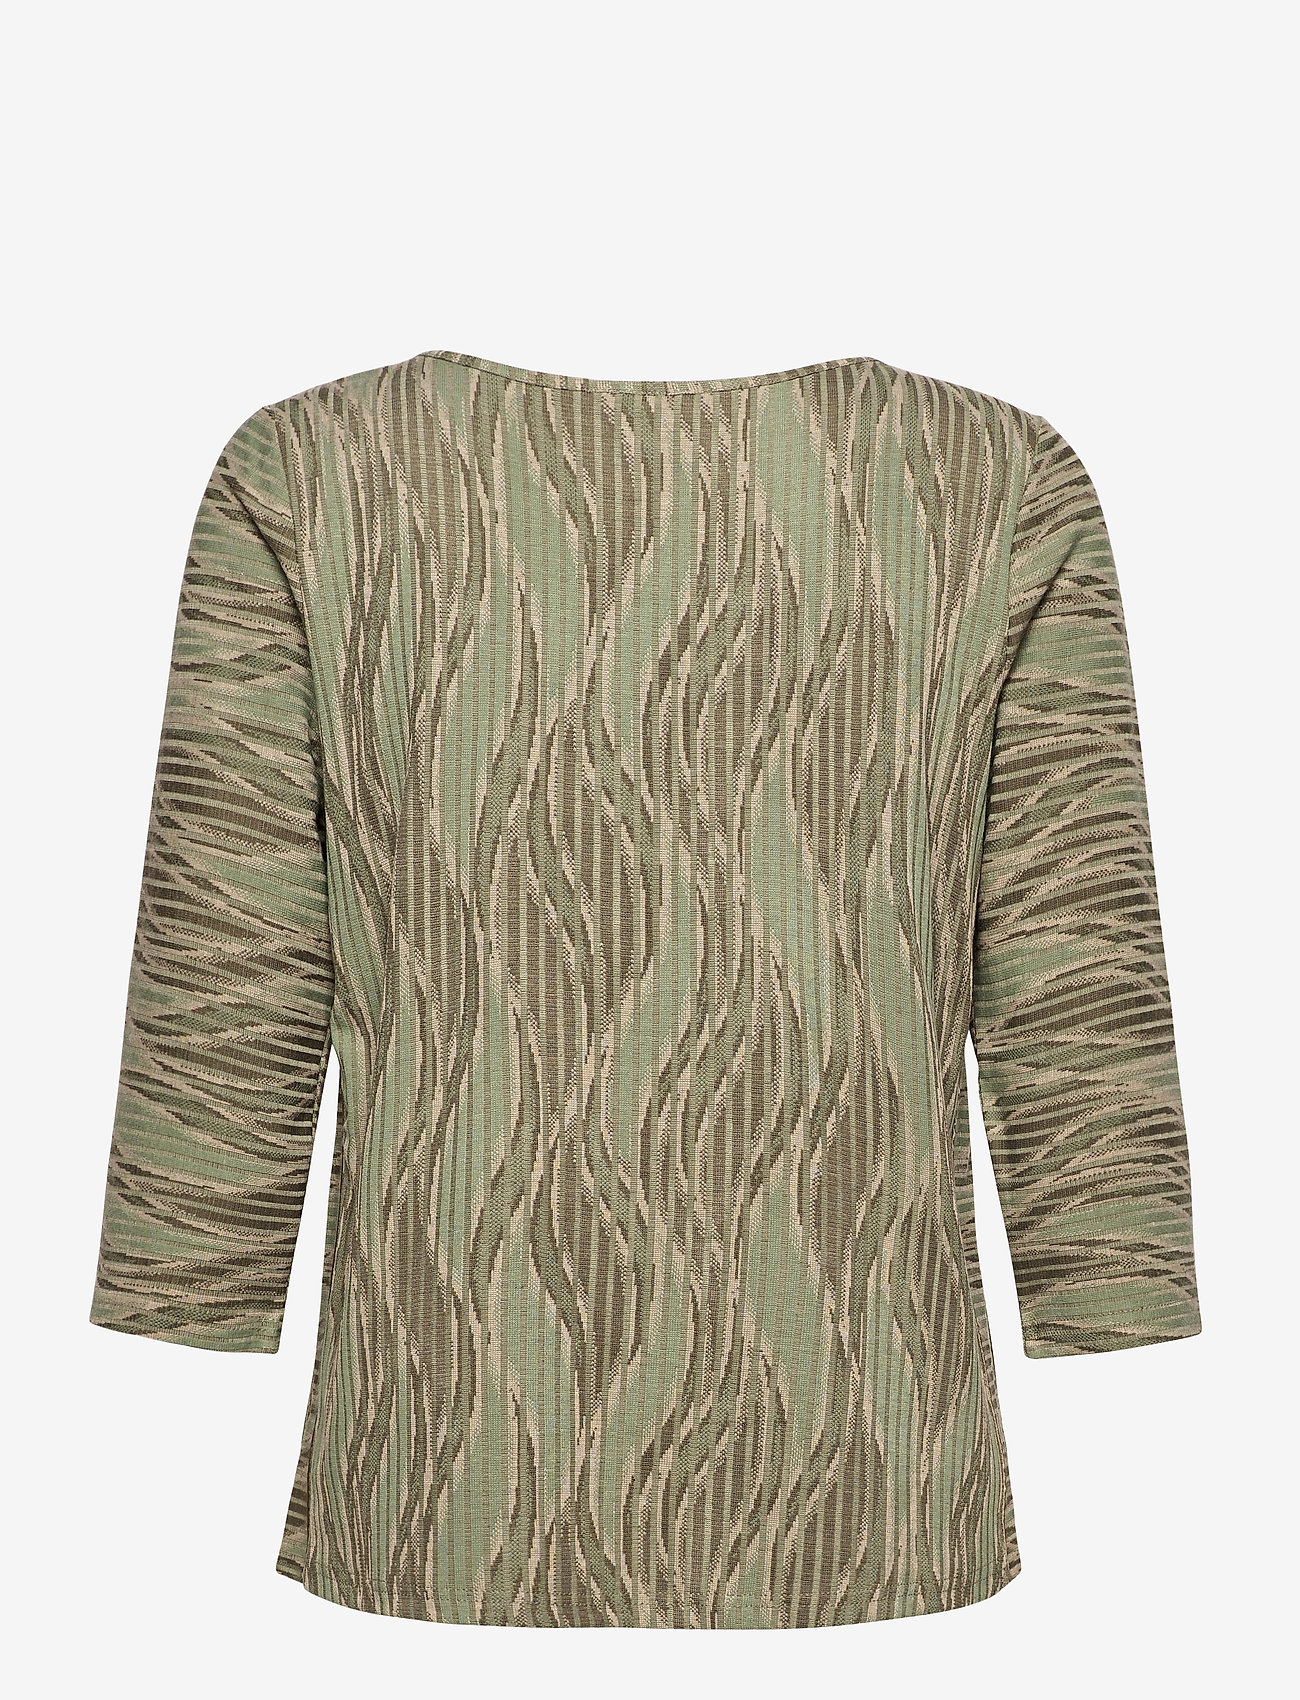 Fransa - FRPEMISO 1 T-shirt - pitkähihaiset t-paidat - hedge mix - 1